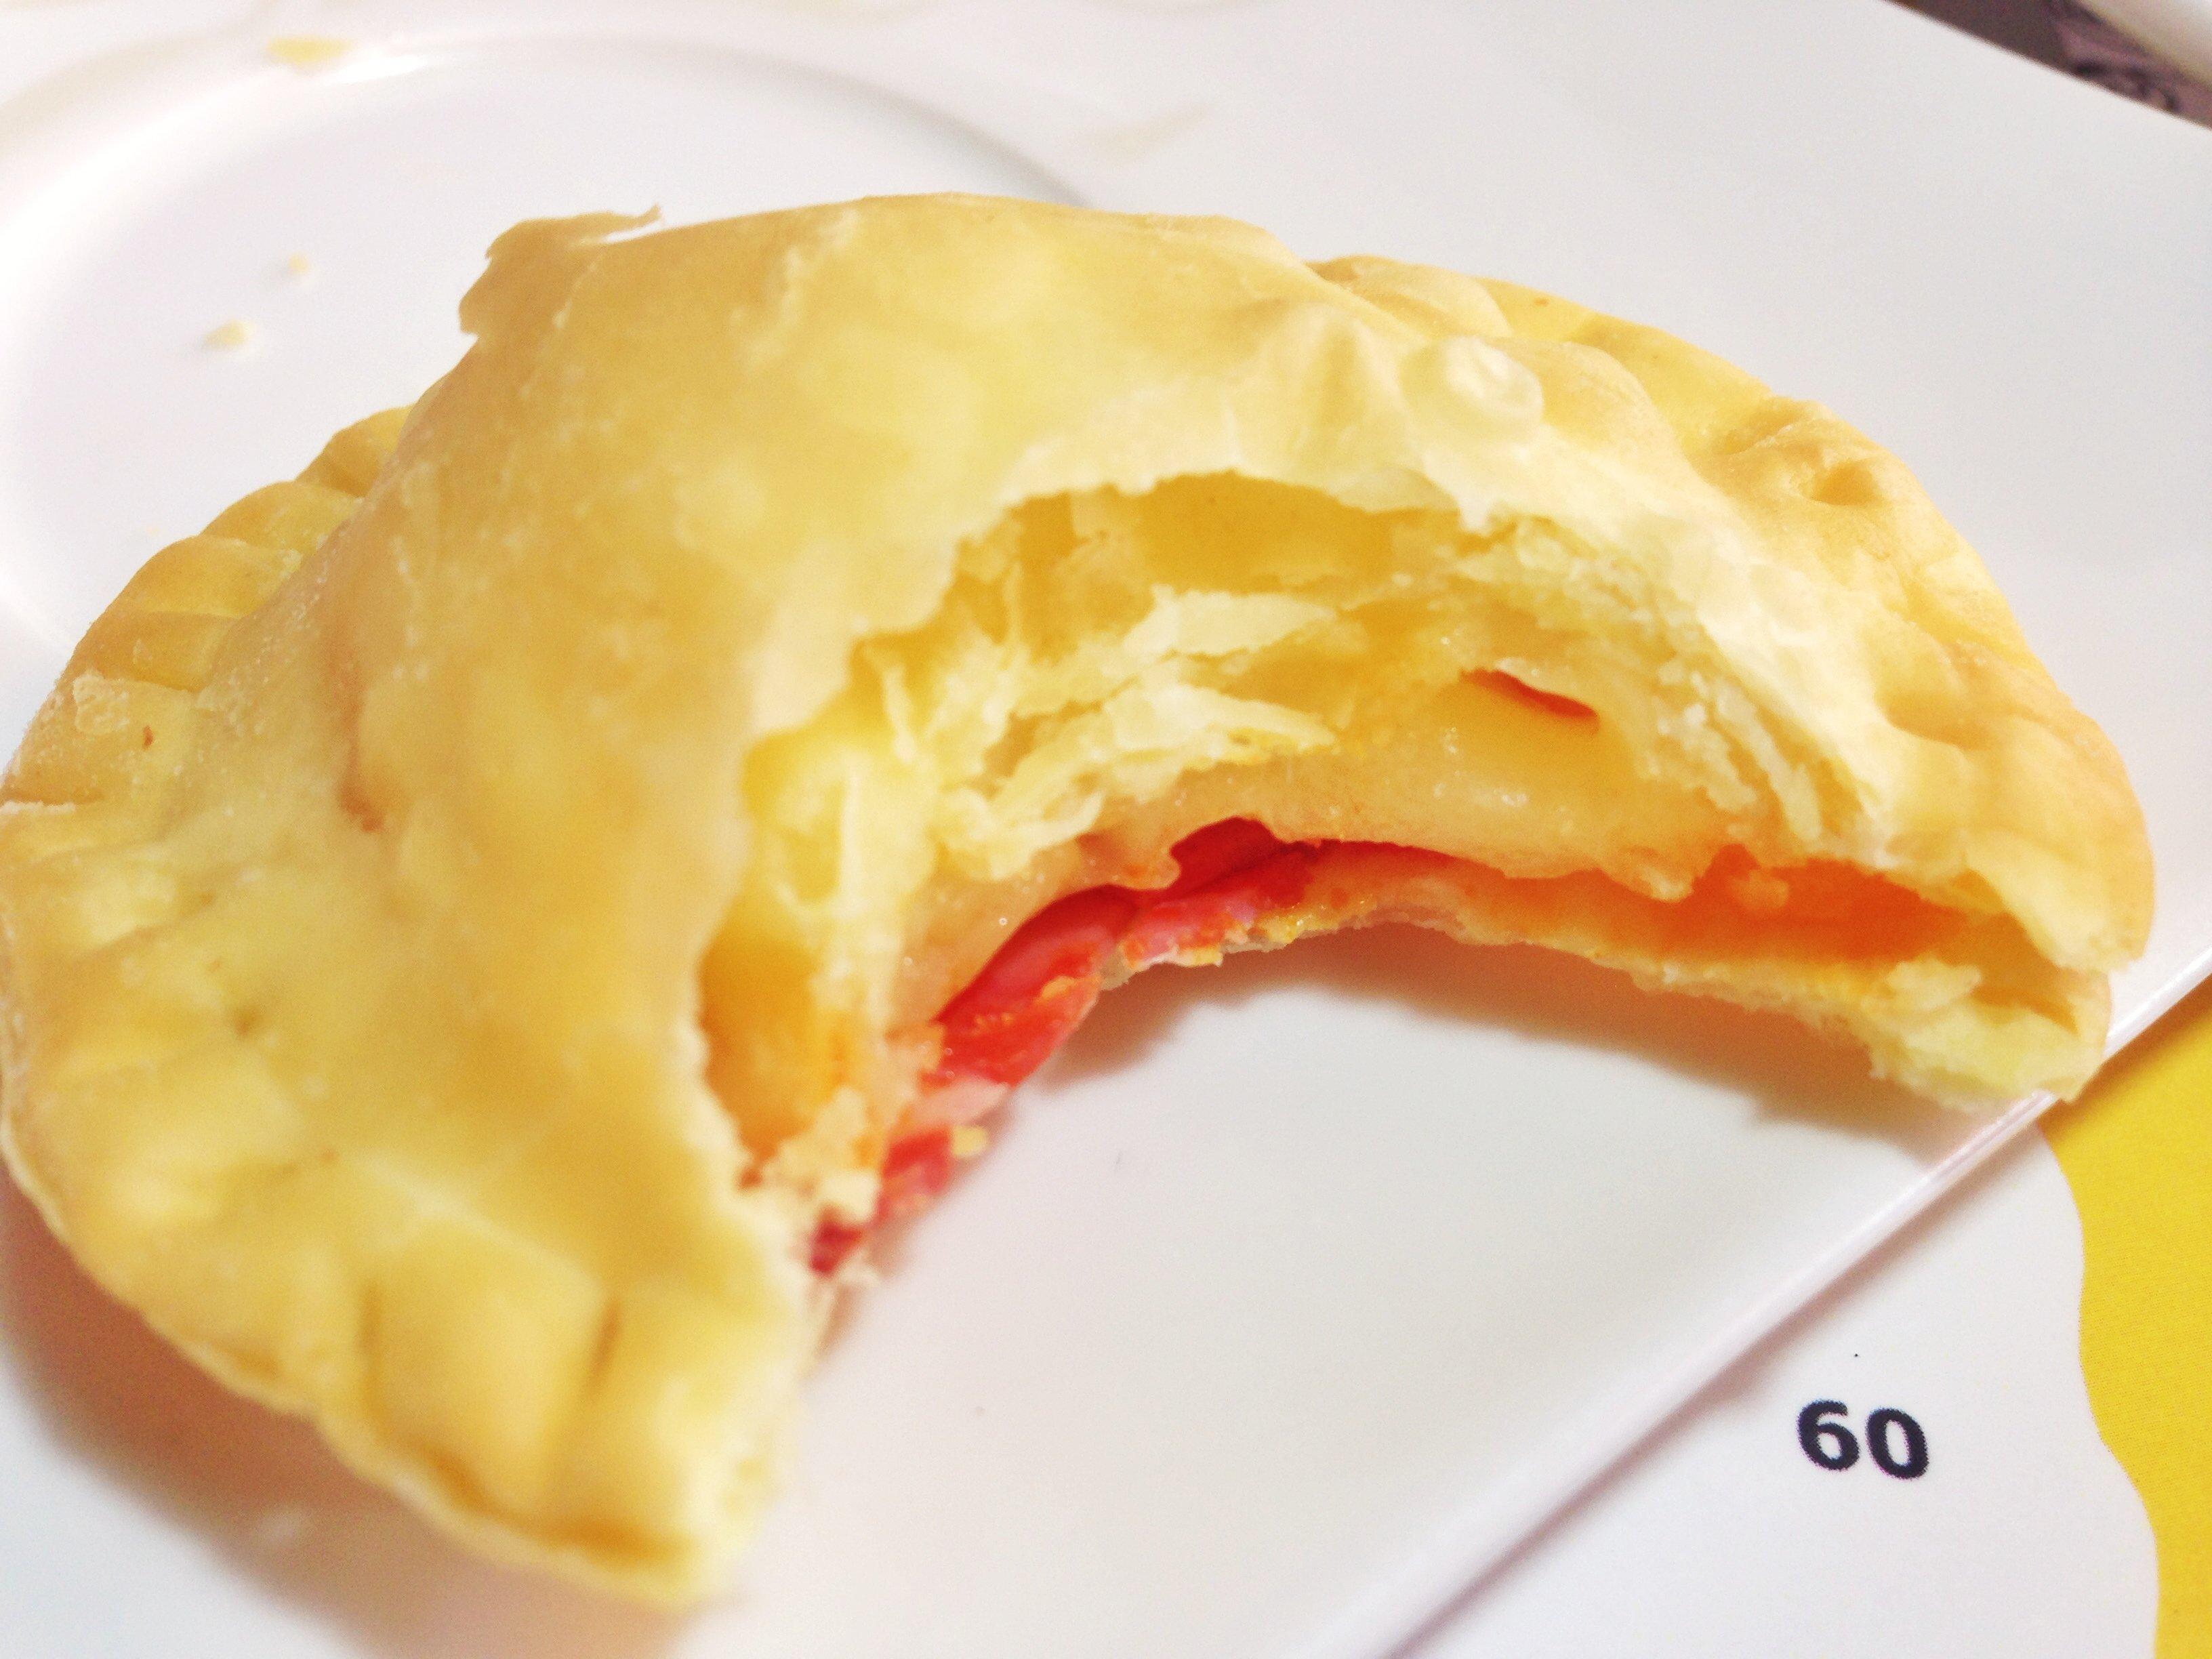 Pastelito de queso y chorizo.